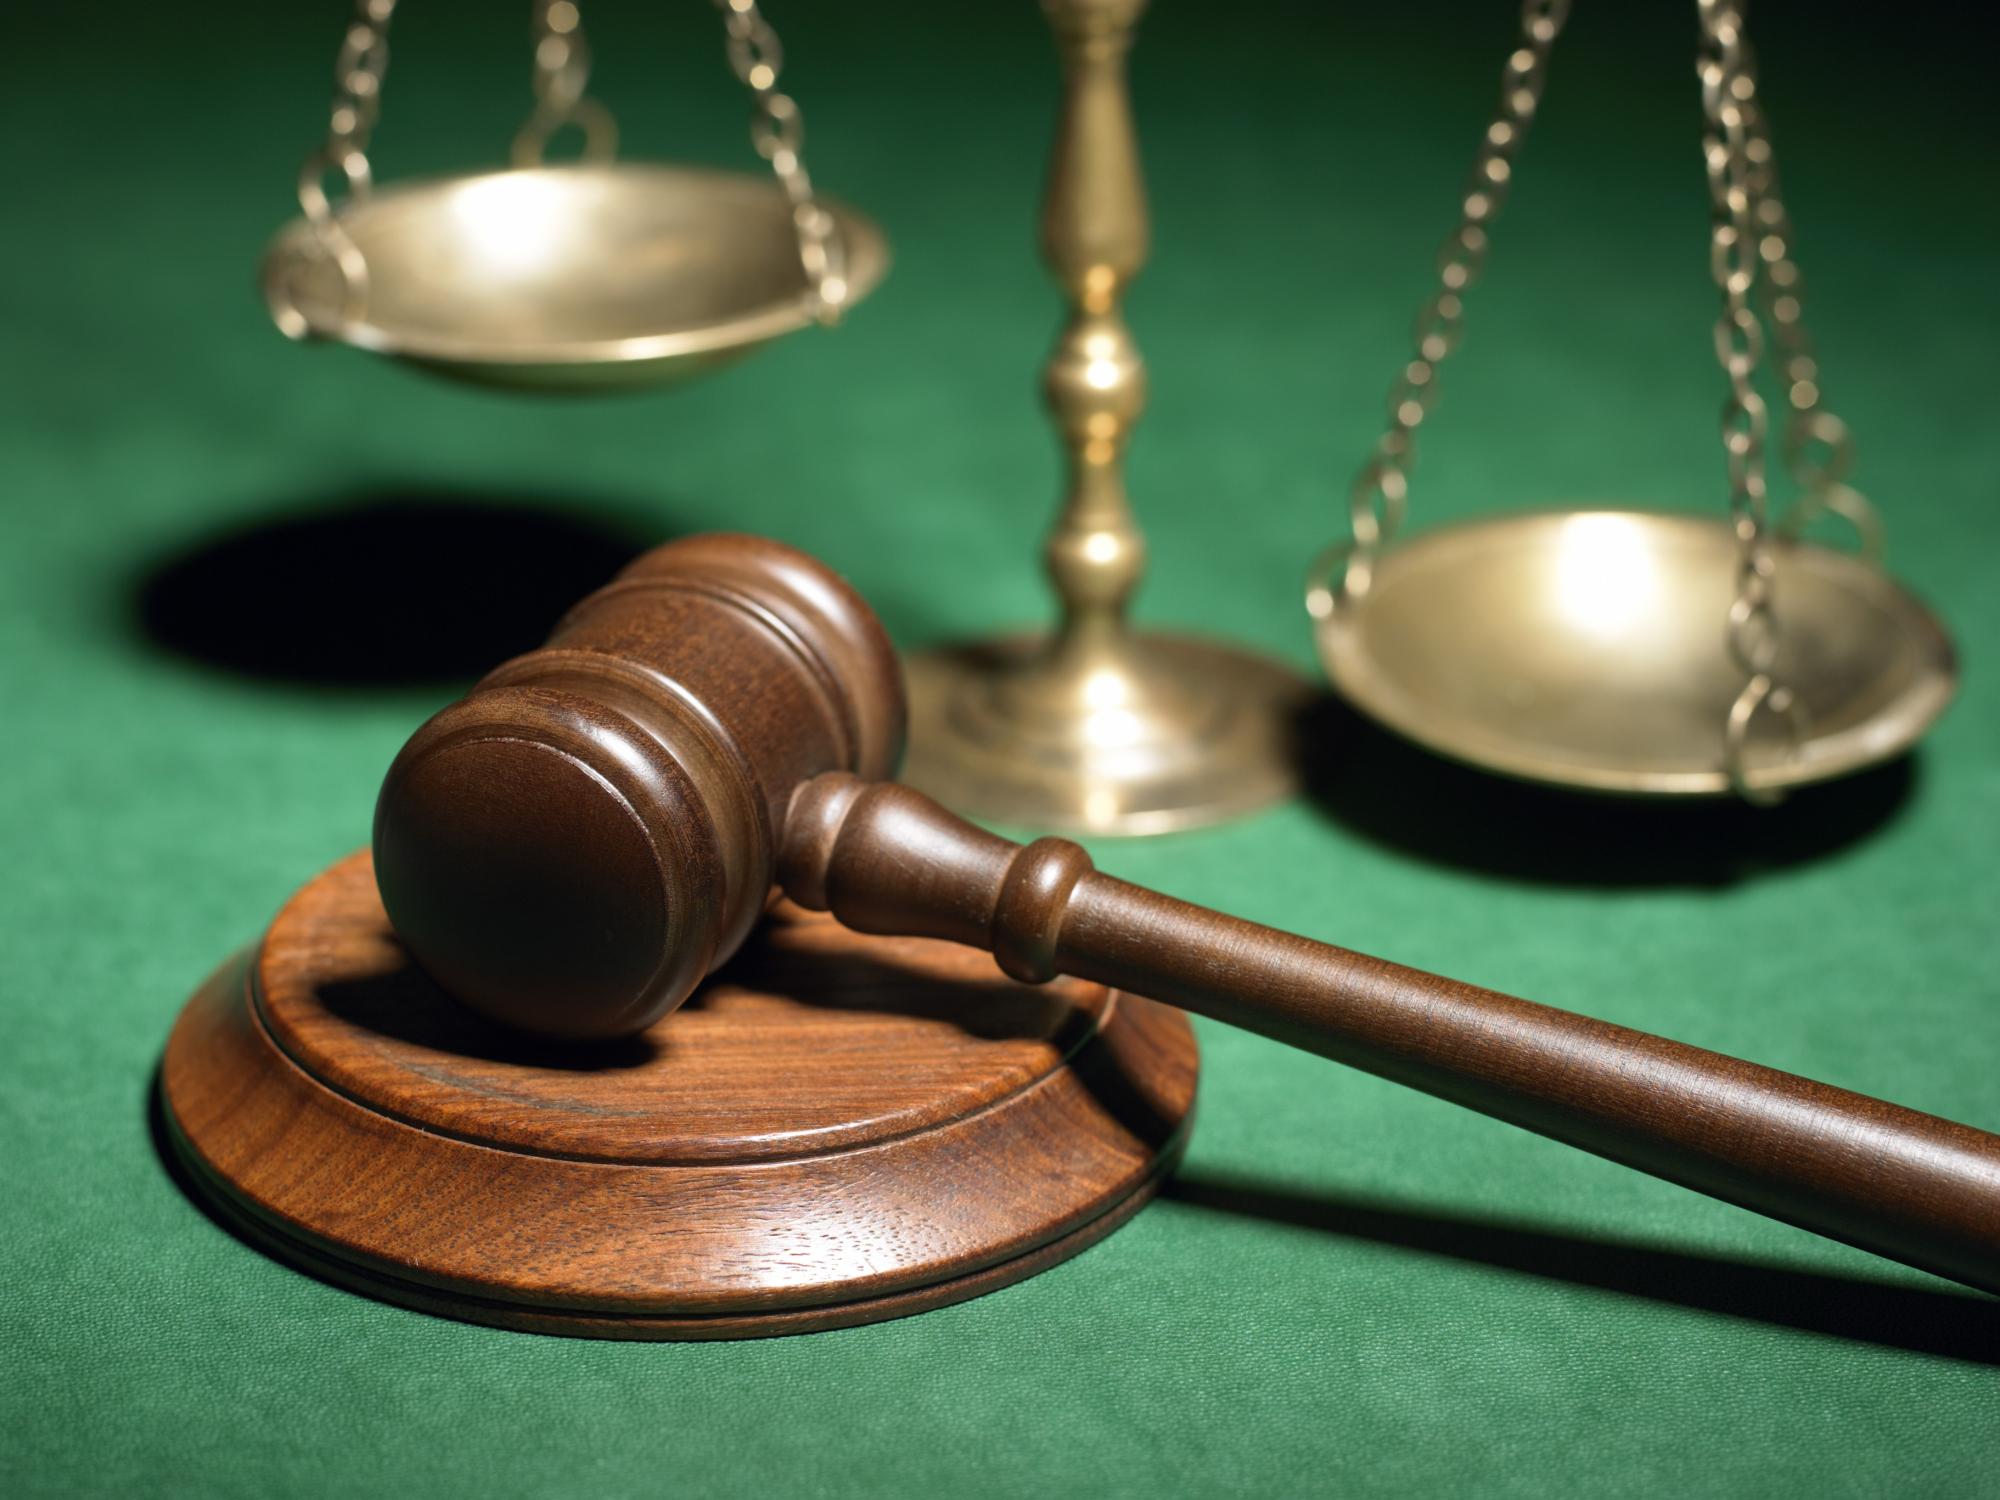 IHRDA, Changement Social Bénin challenge Benin Constitutional Court decision on Benin's obligation to implement ECOWAS Court decisions